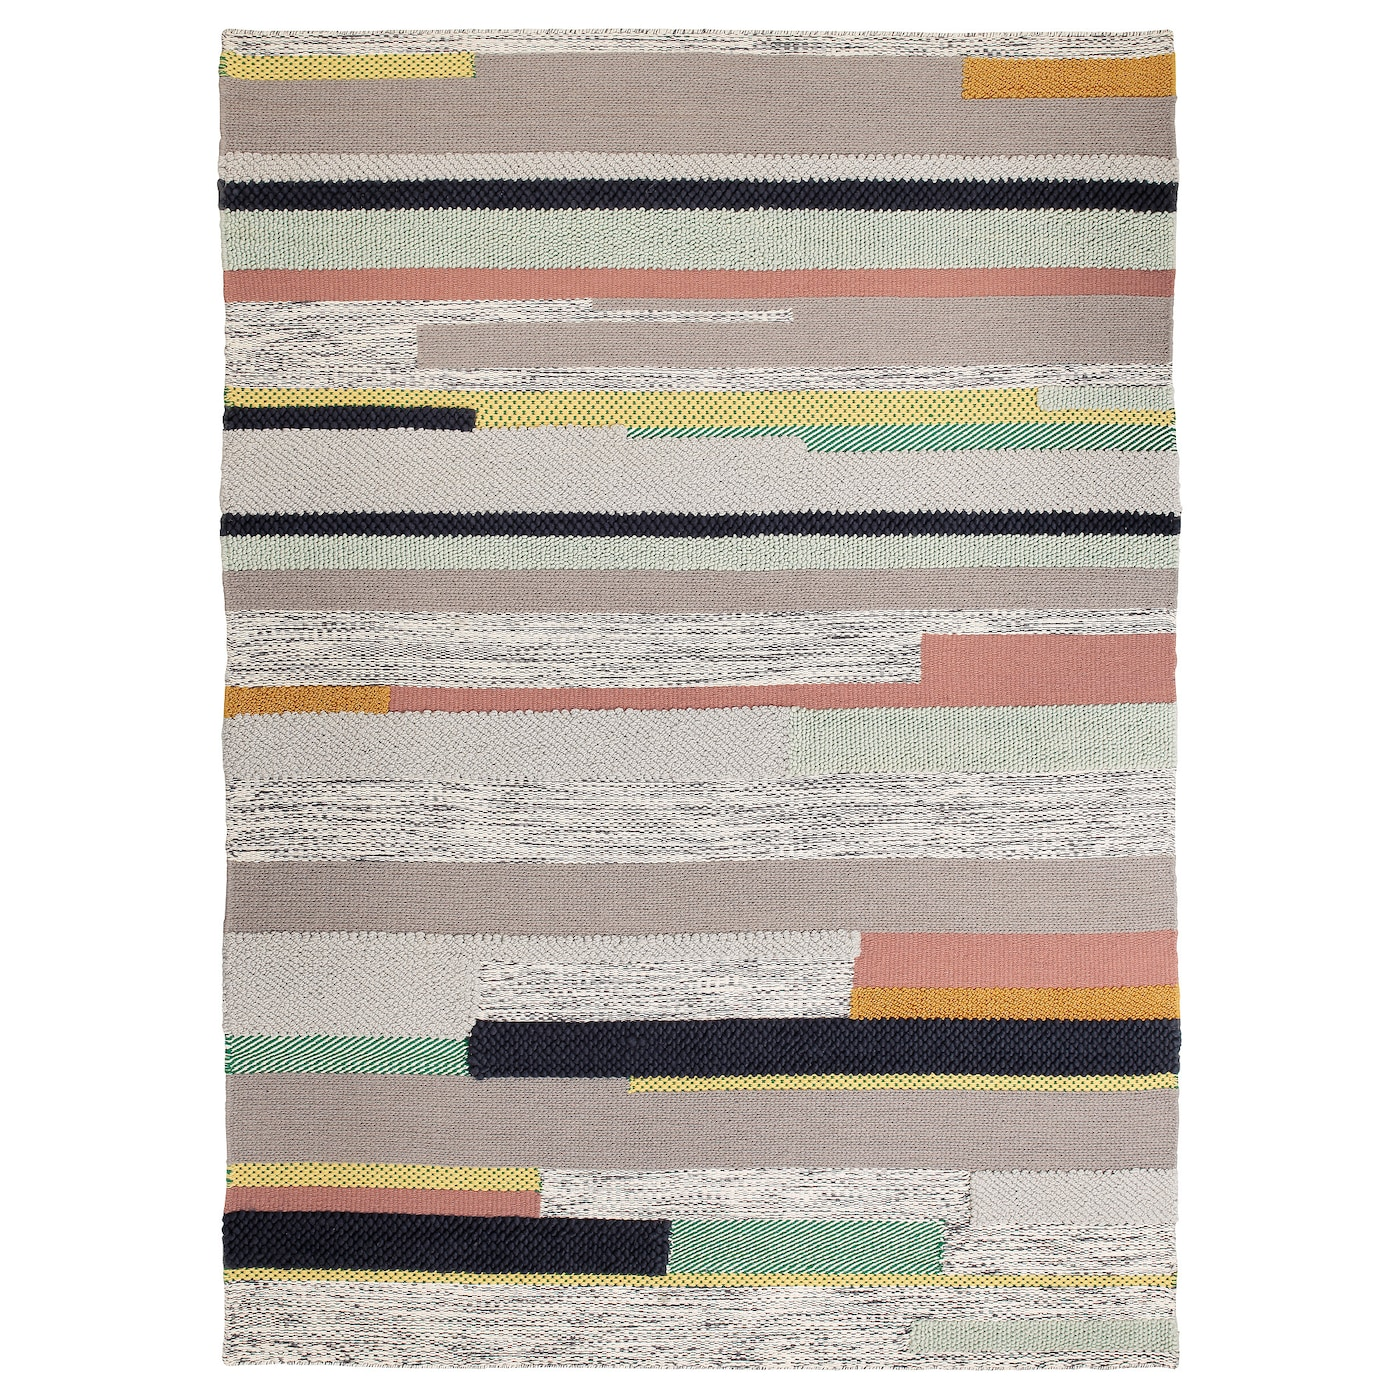 br nden tapis poils ras fait main multicolore 170x240 cm ikea. Black Bedroom Furniture Sets. Home Design Ideas